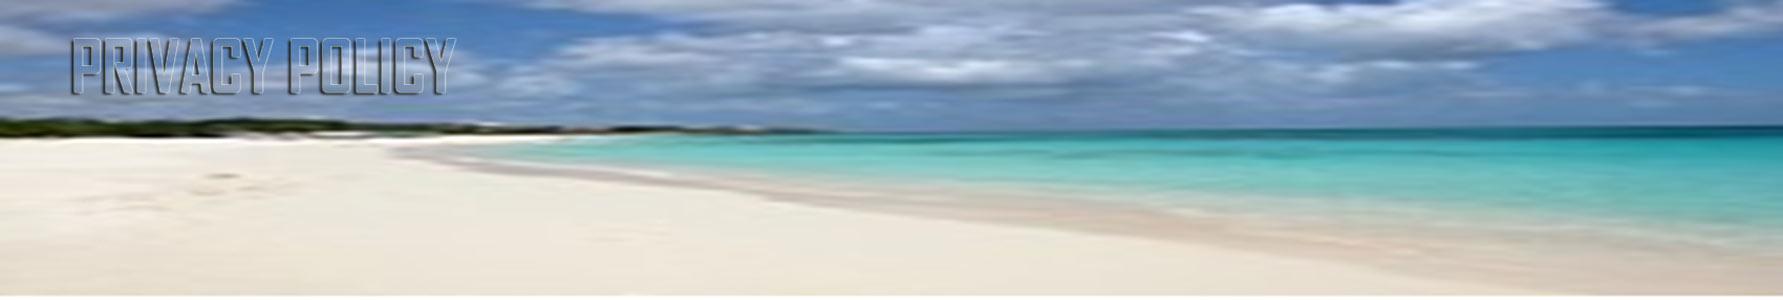 Privacy Policy - Sahuaro Shores